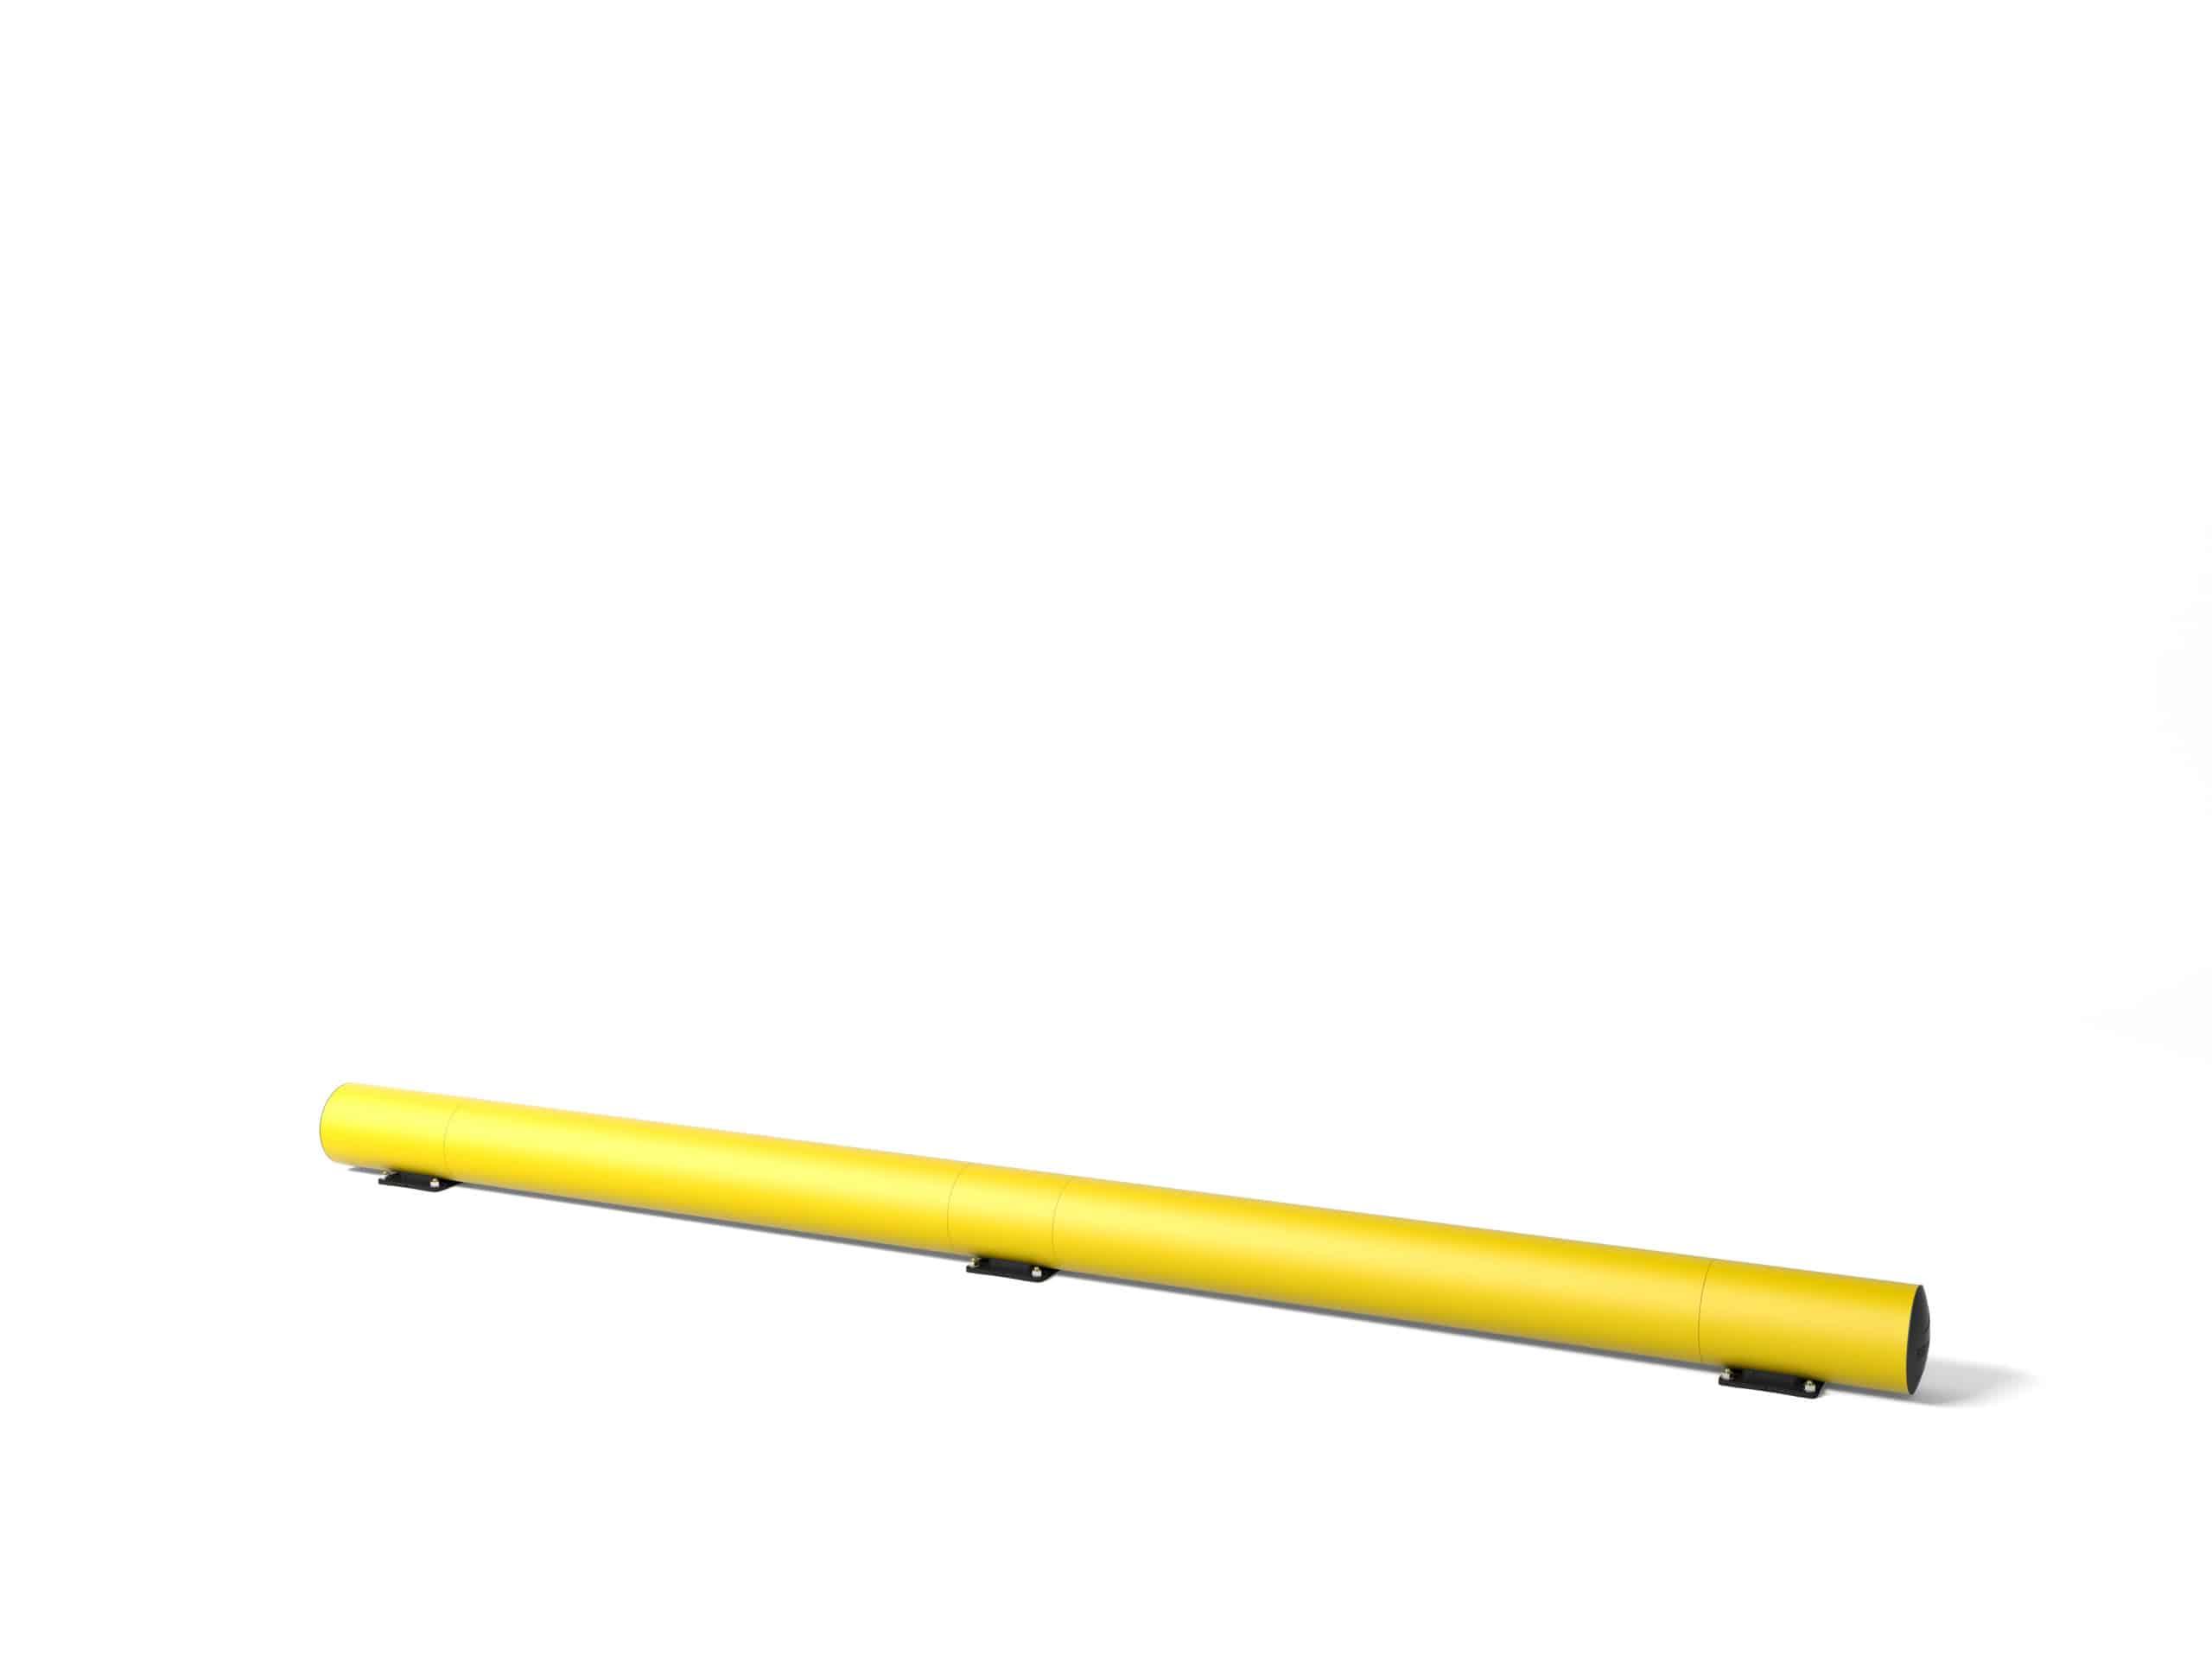 Rammschutzplanke boplan® TB200 – Set OD Länge =  3700mm – gelb